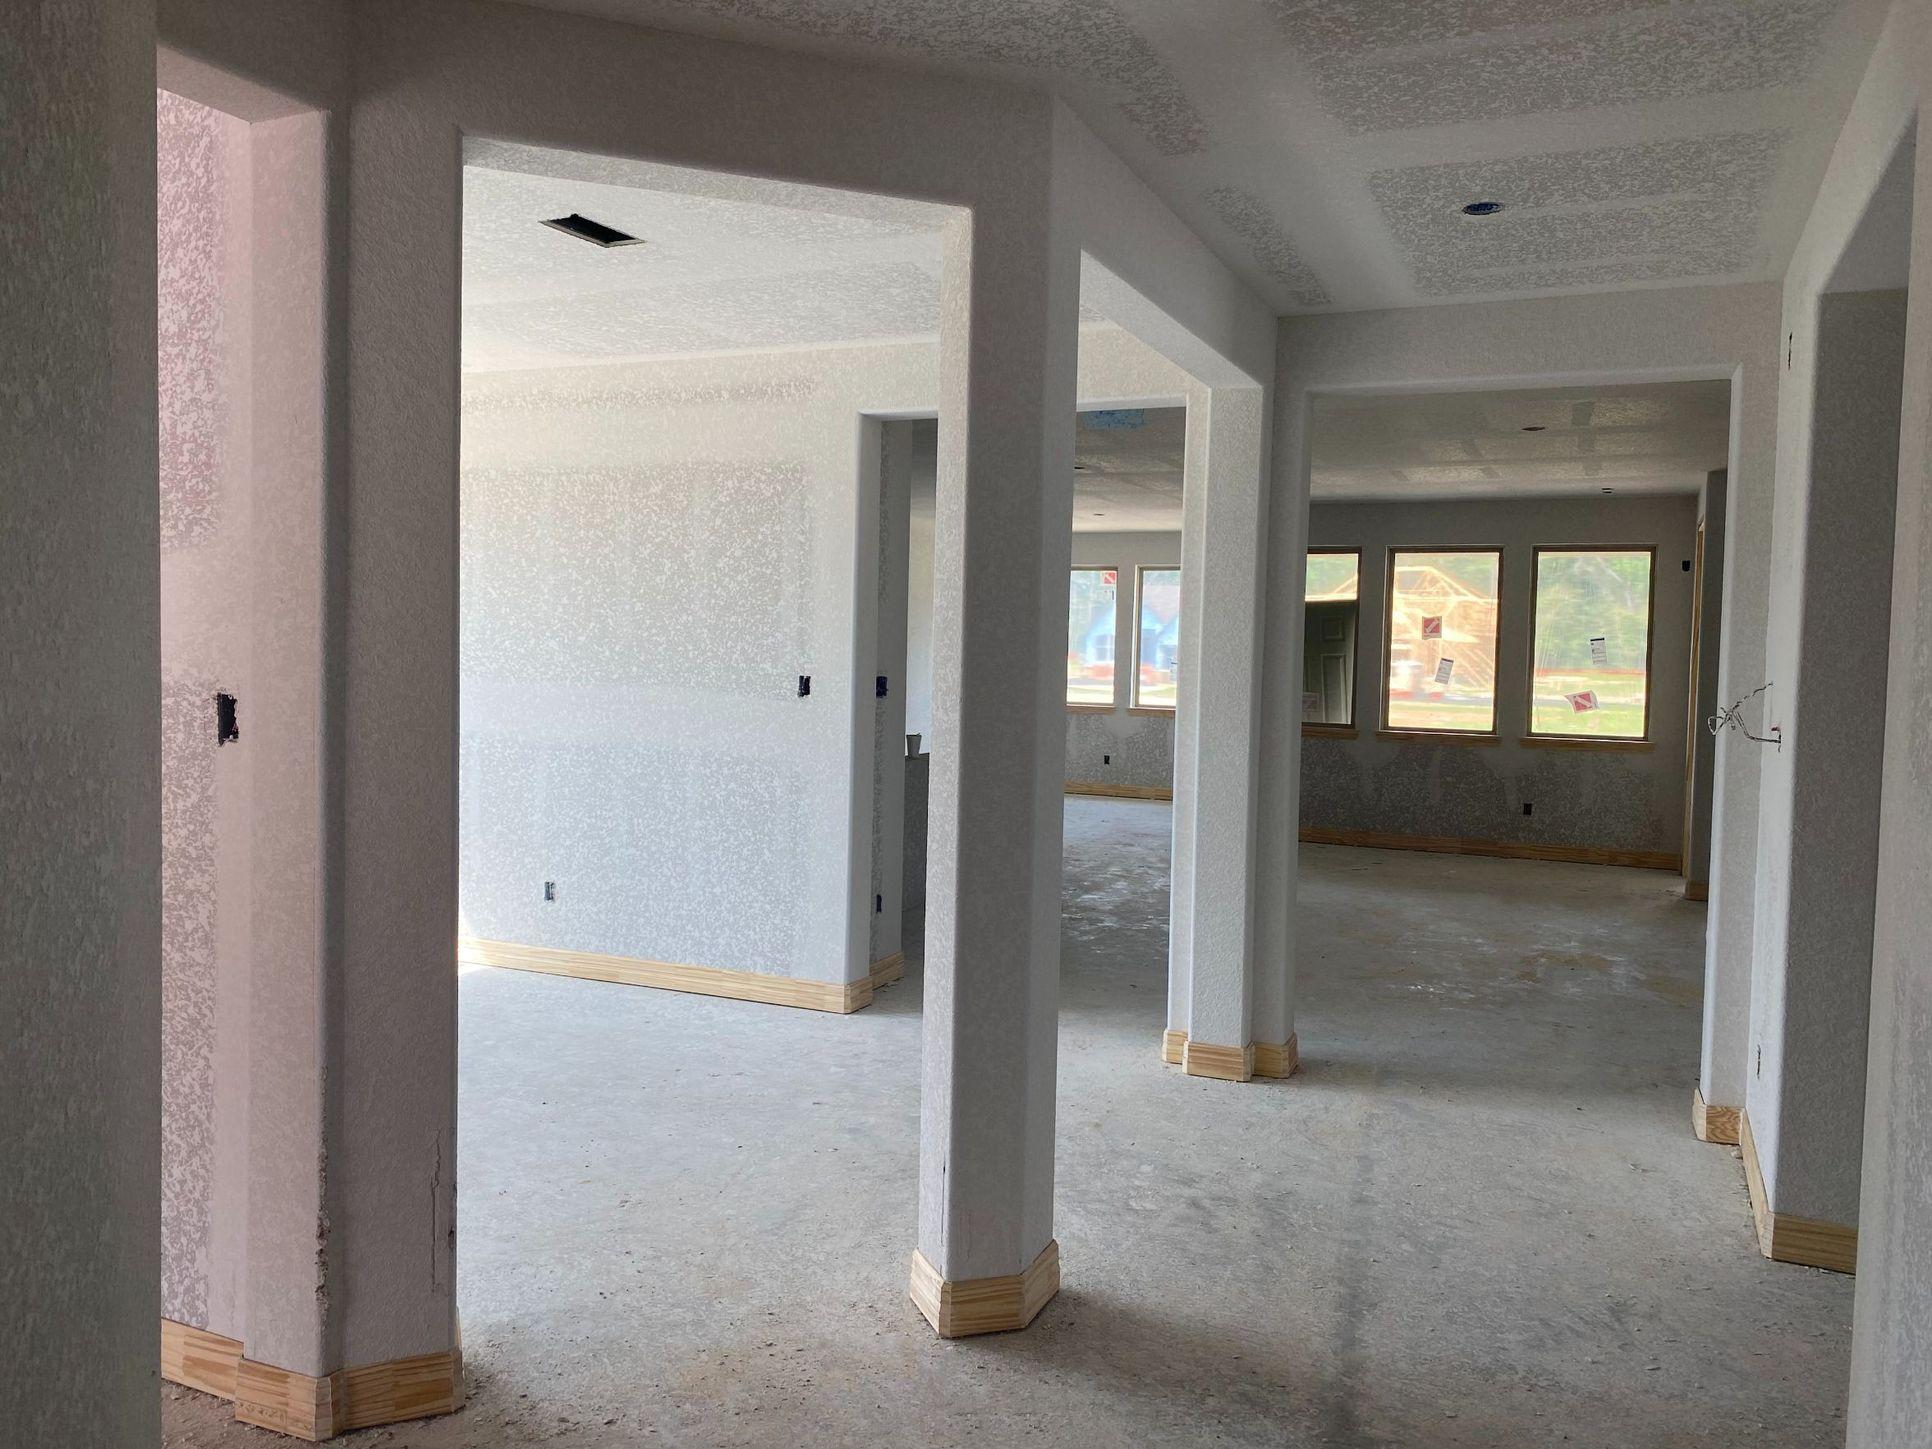 Exterior:31015 Oakley Glen Court Elevation Image 2